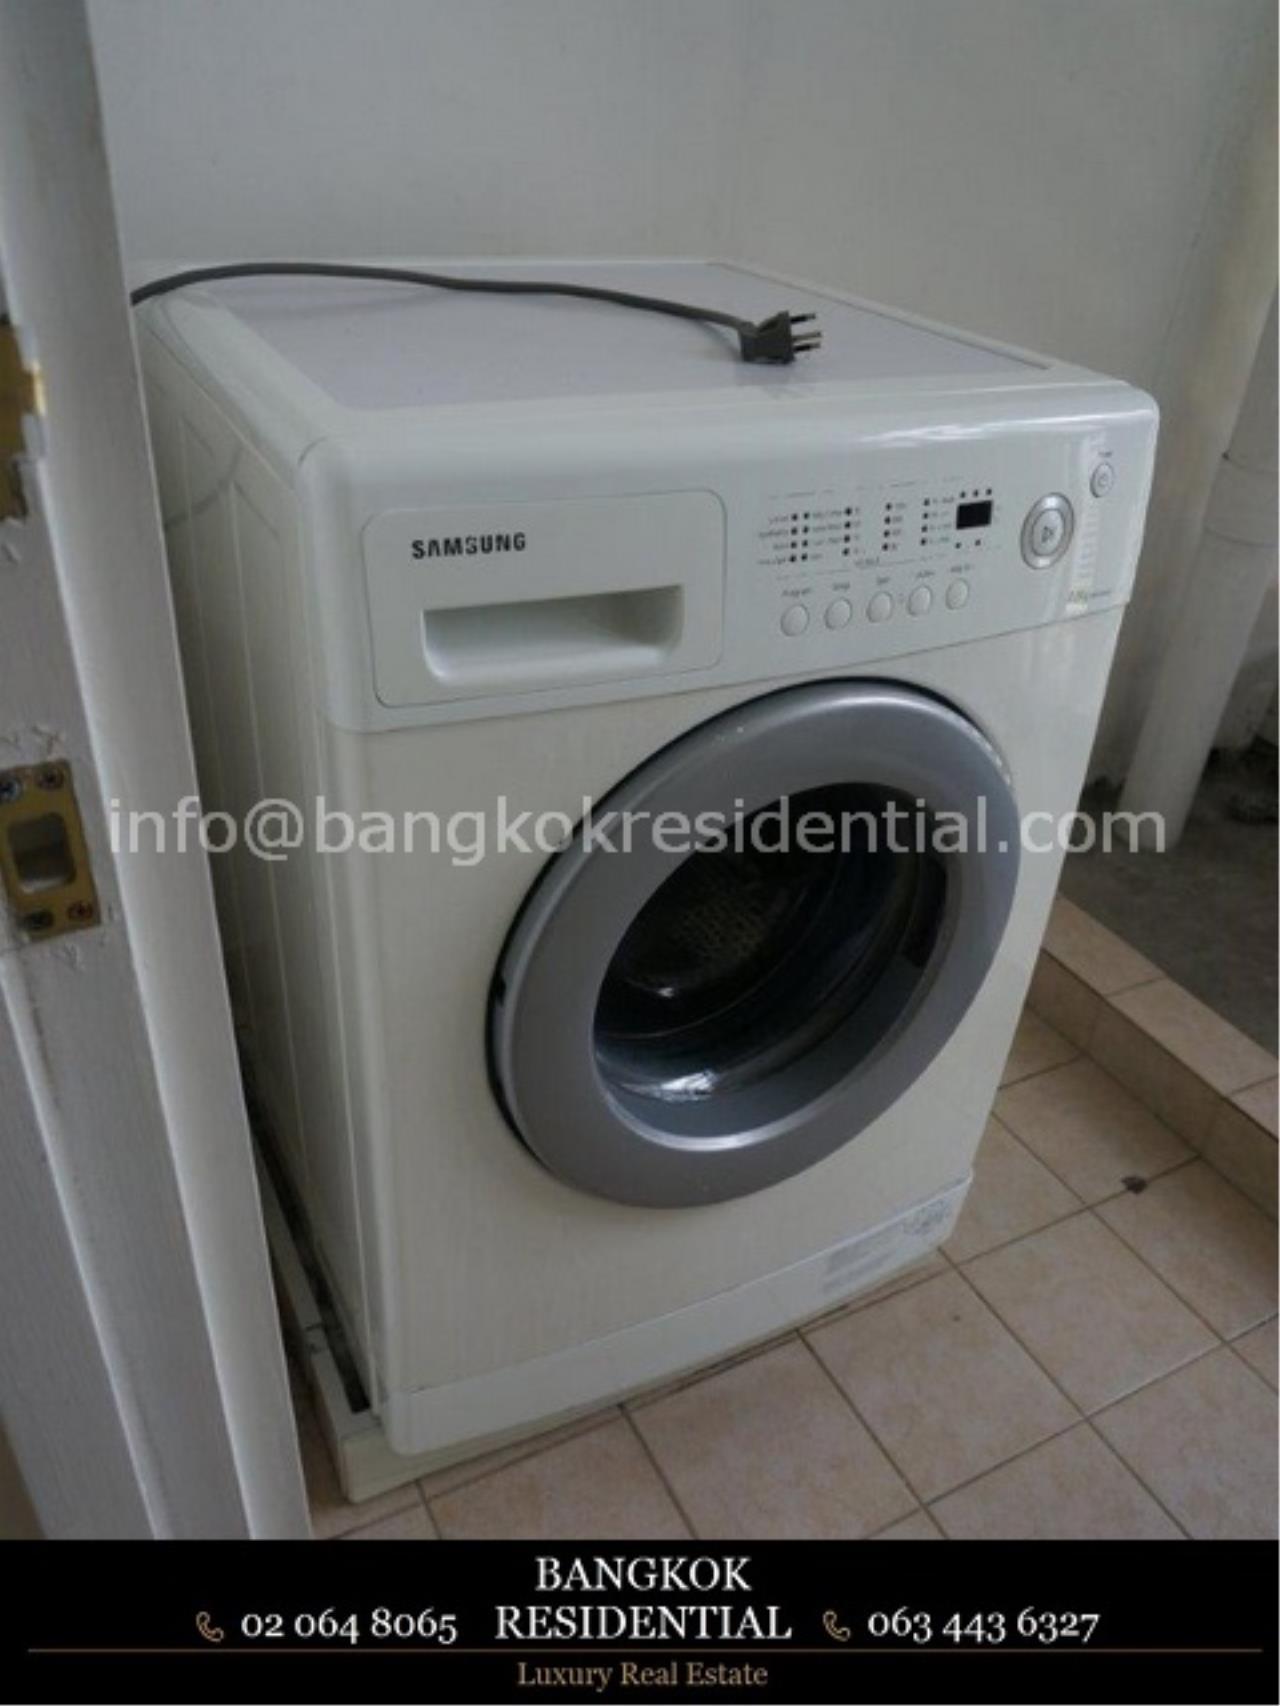 Bangkok Residential Agency's 3BR Athenee Residence For Sale Or Rent (BR3386CD) 13